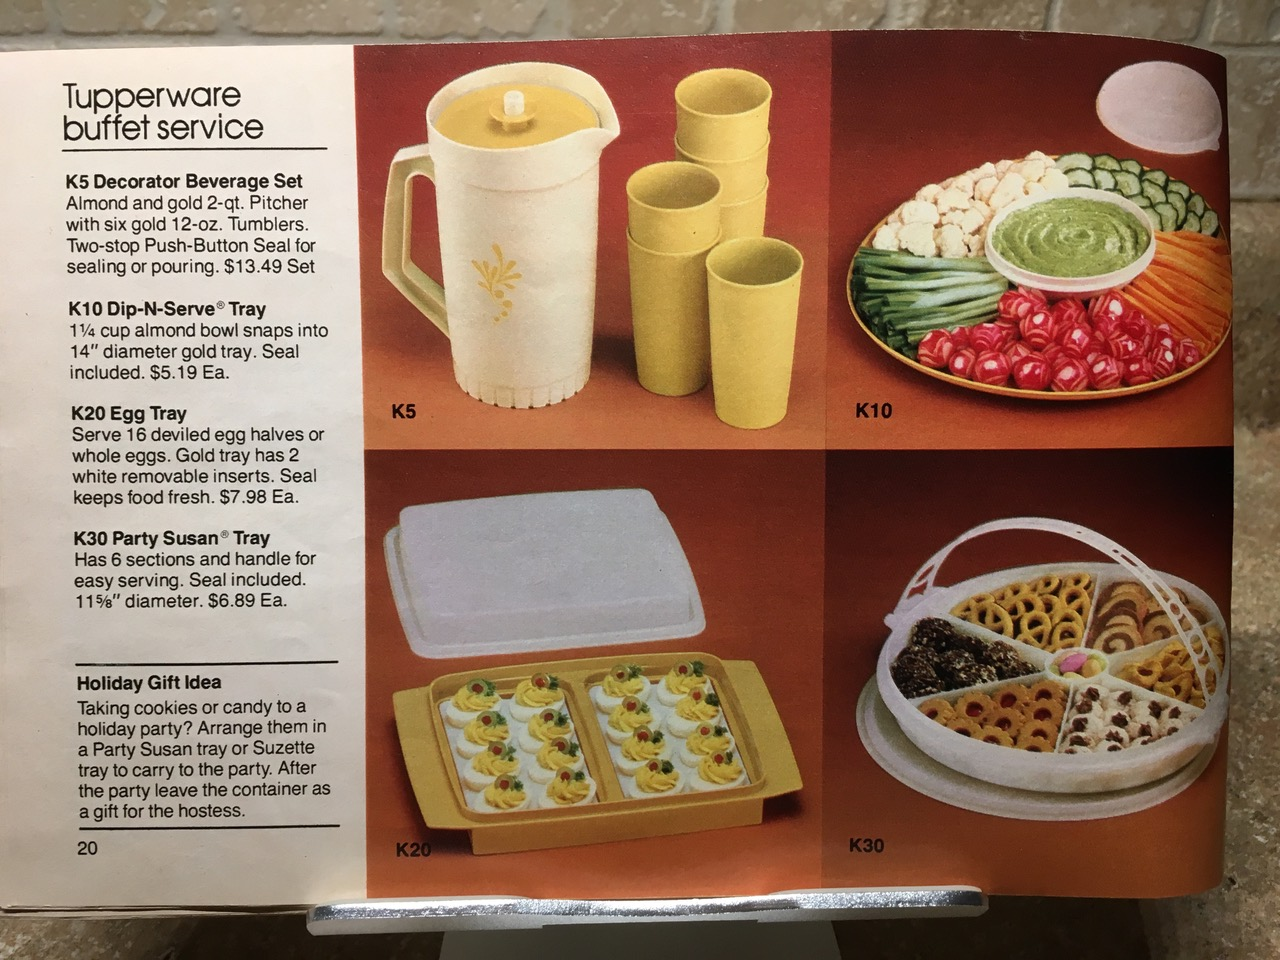 1982 Tupperware Buffet Service Lead Safe Mama Vintage Toxic Tupperware